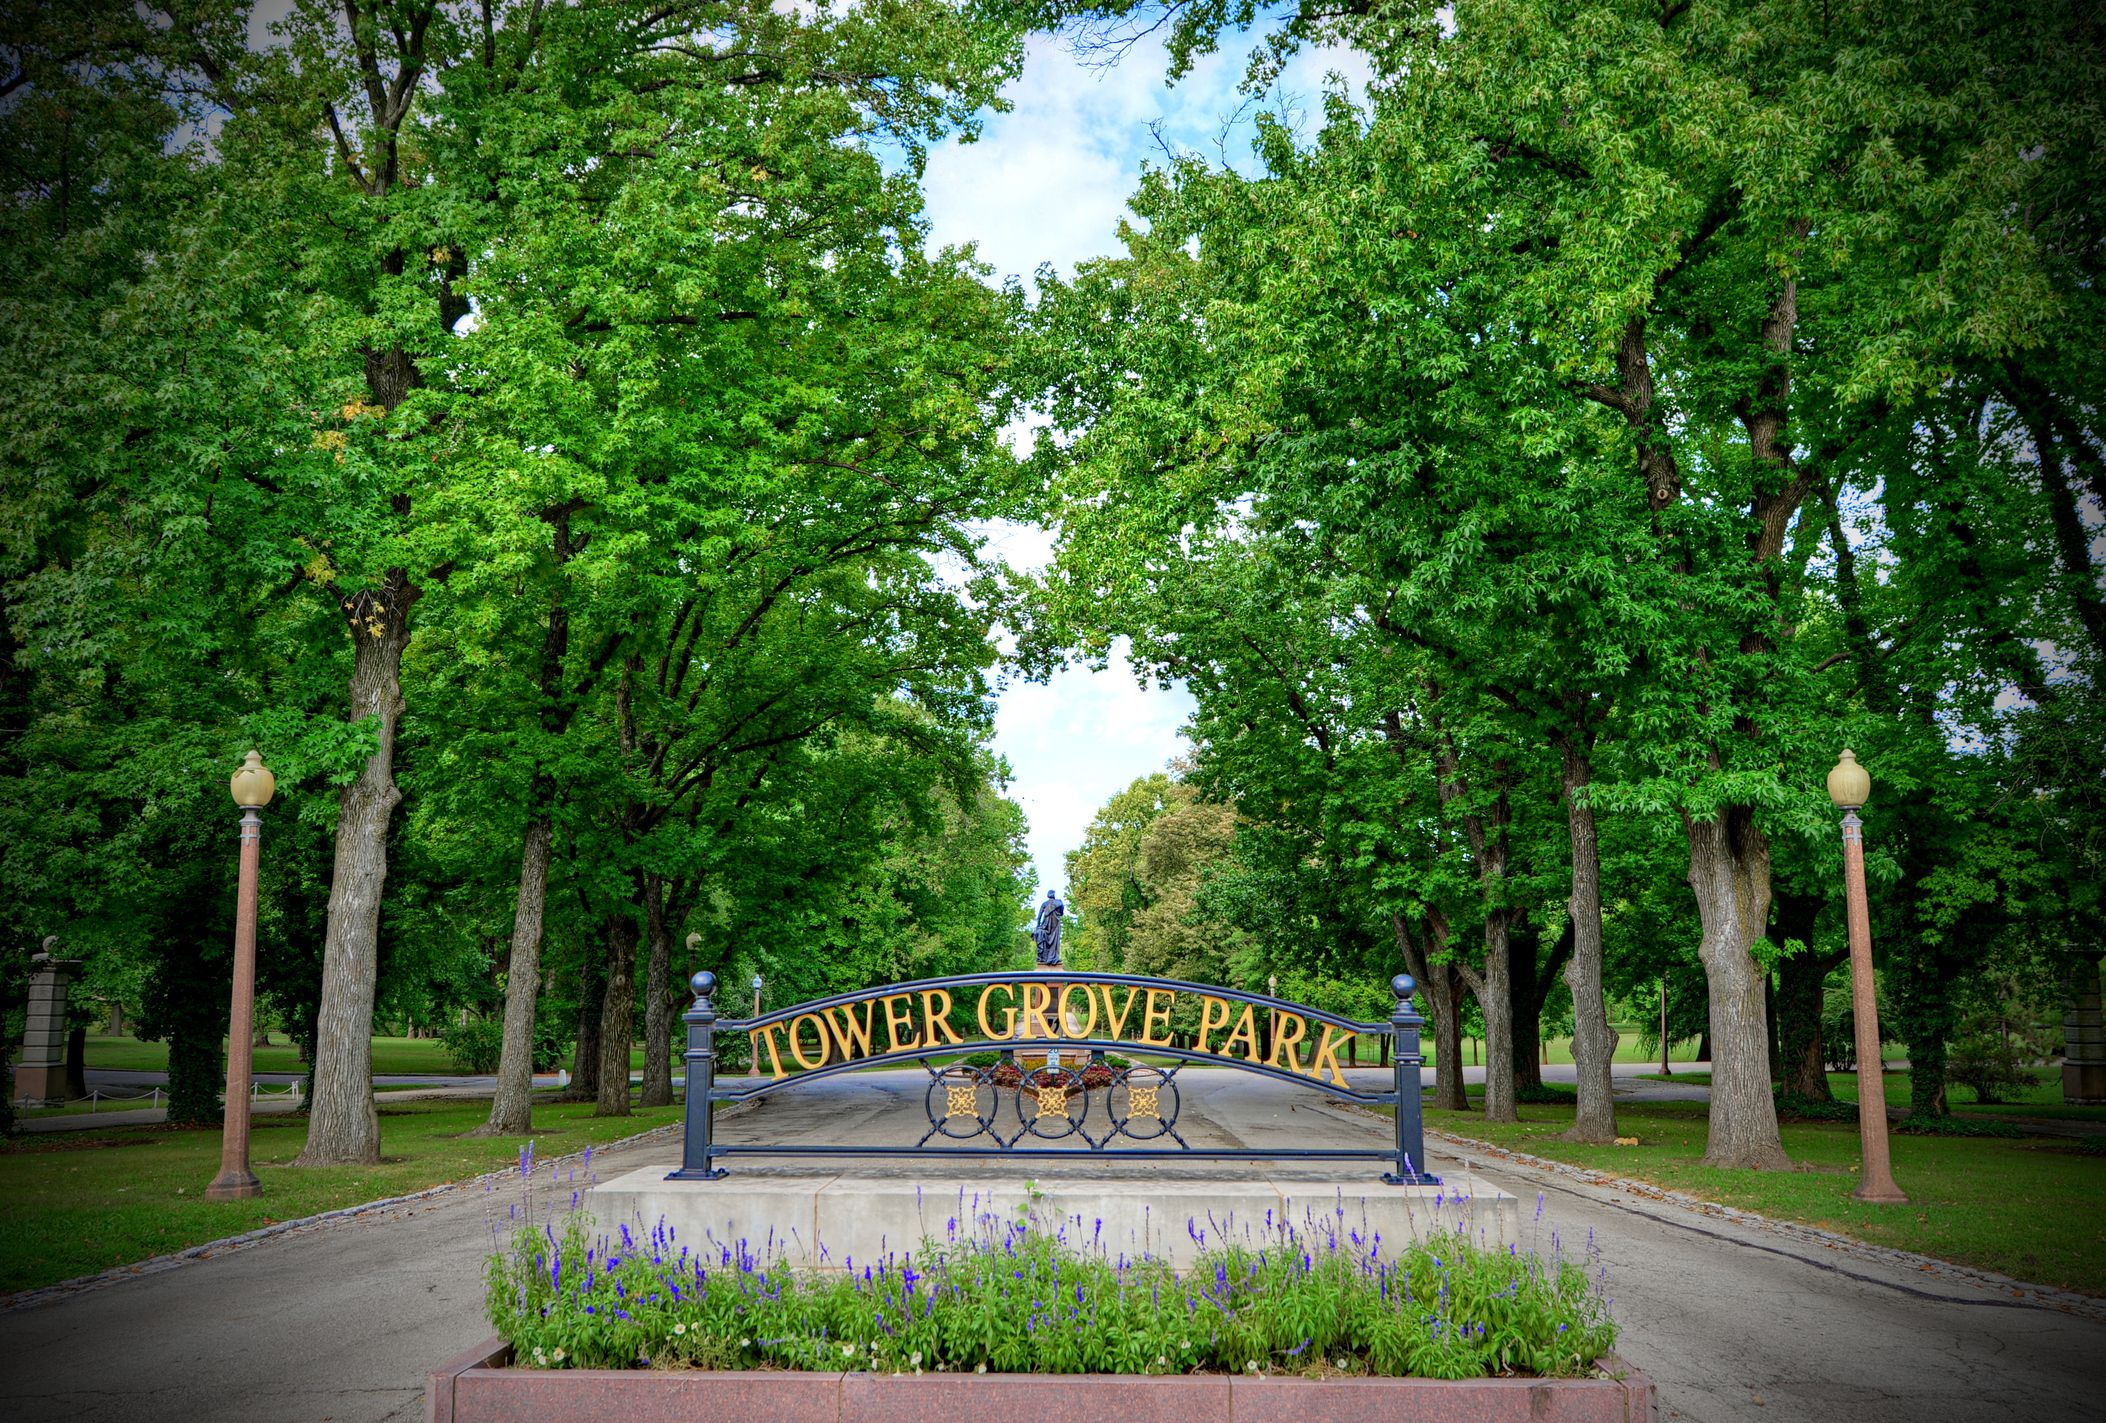 Tower Grove Park in St. Louis, Missouri